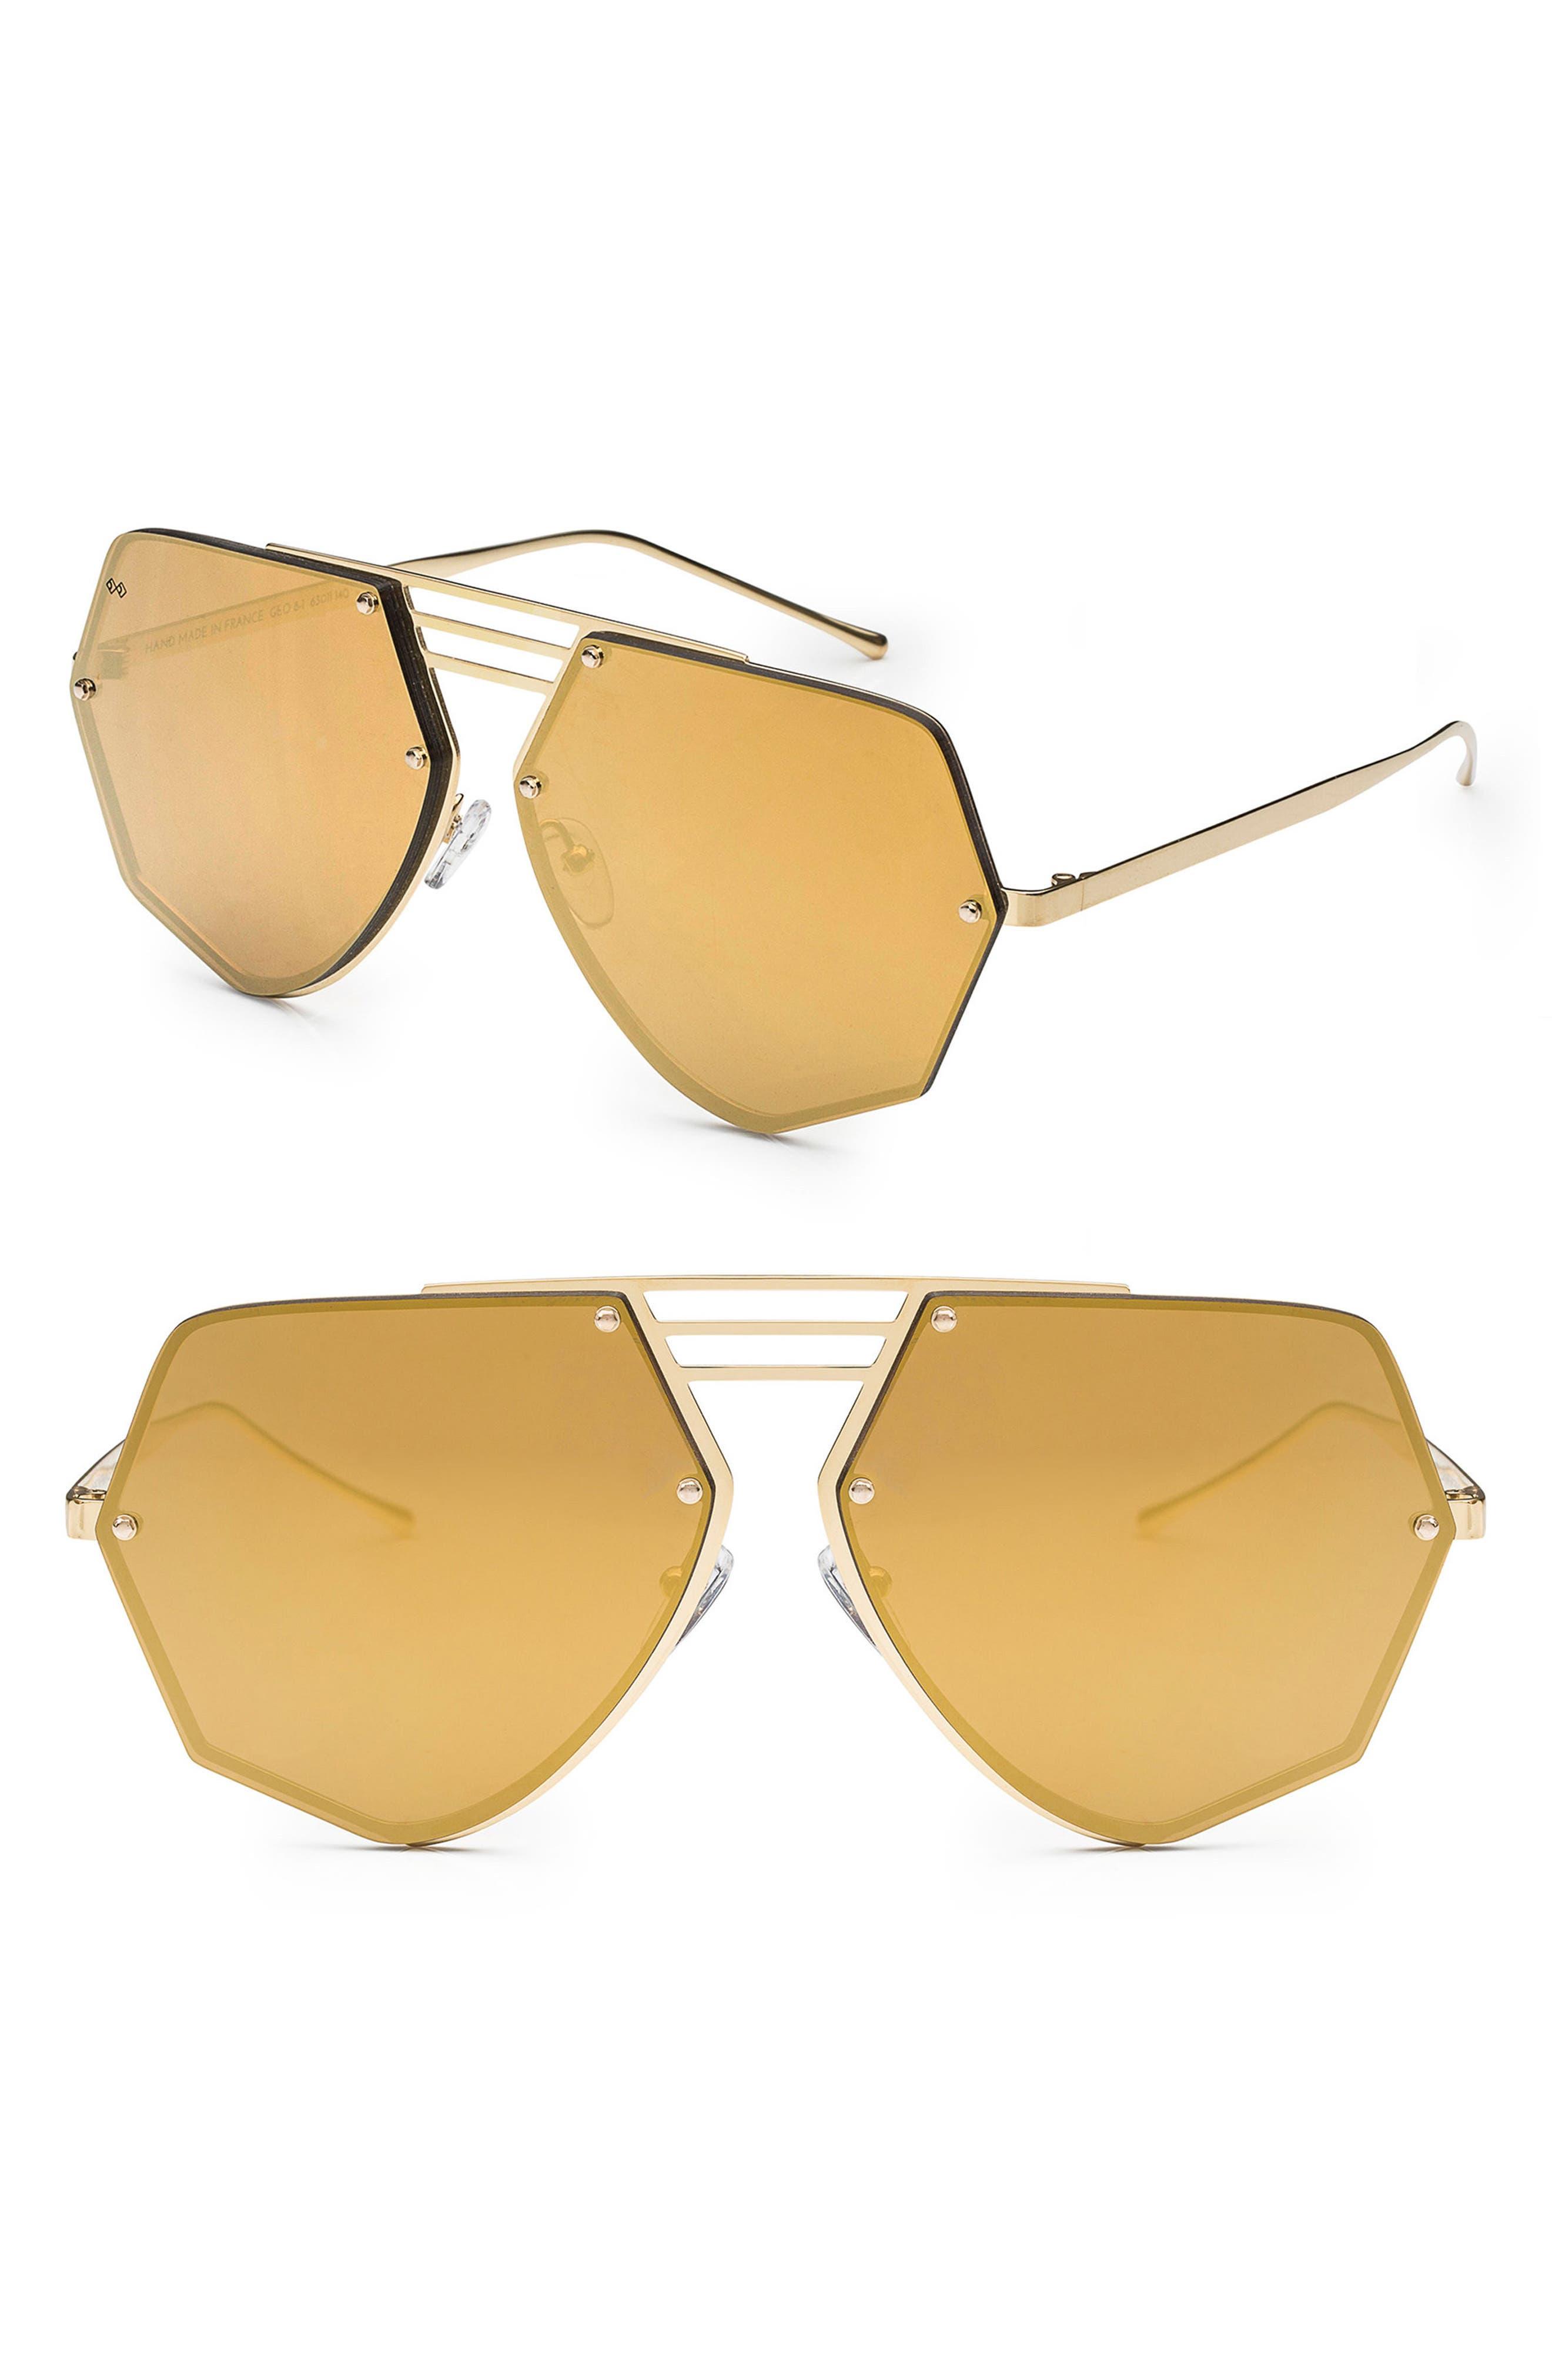 Geo 8 60mm Sunglasses,                             Main thumbnail 1, color,                             Gold/ Gold Mirror